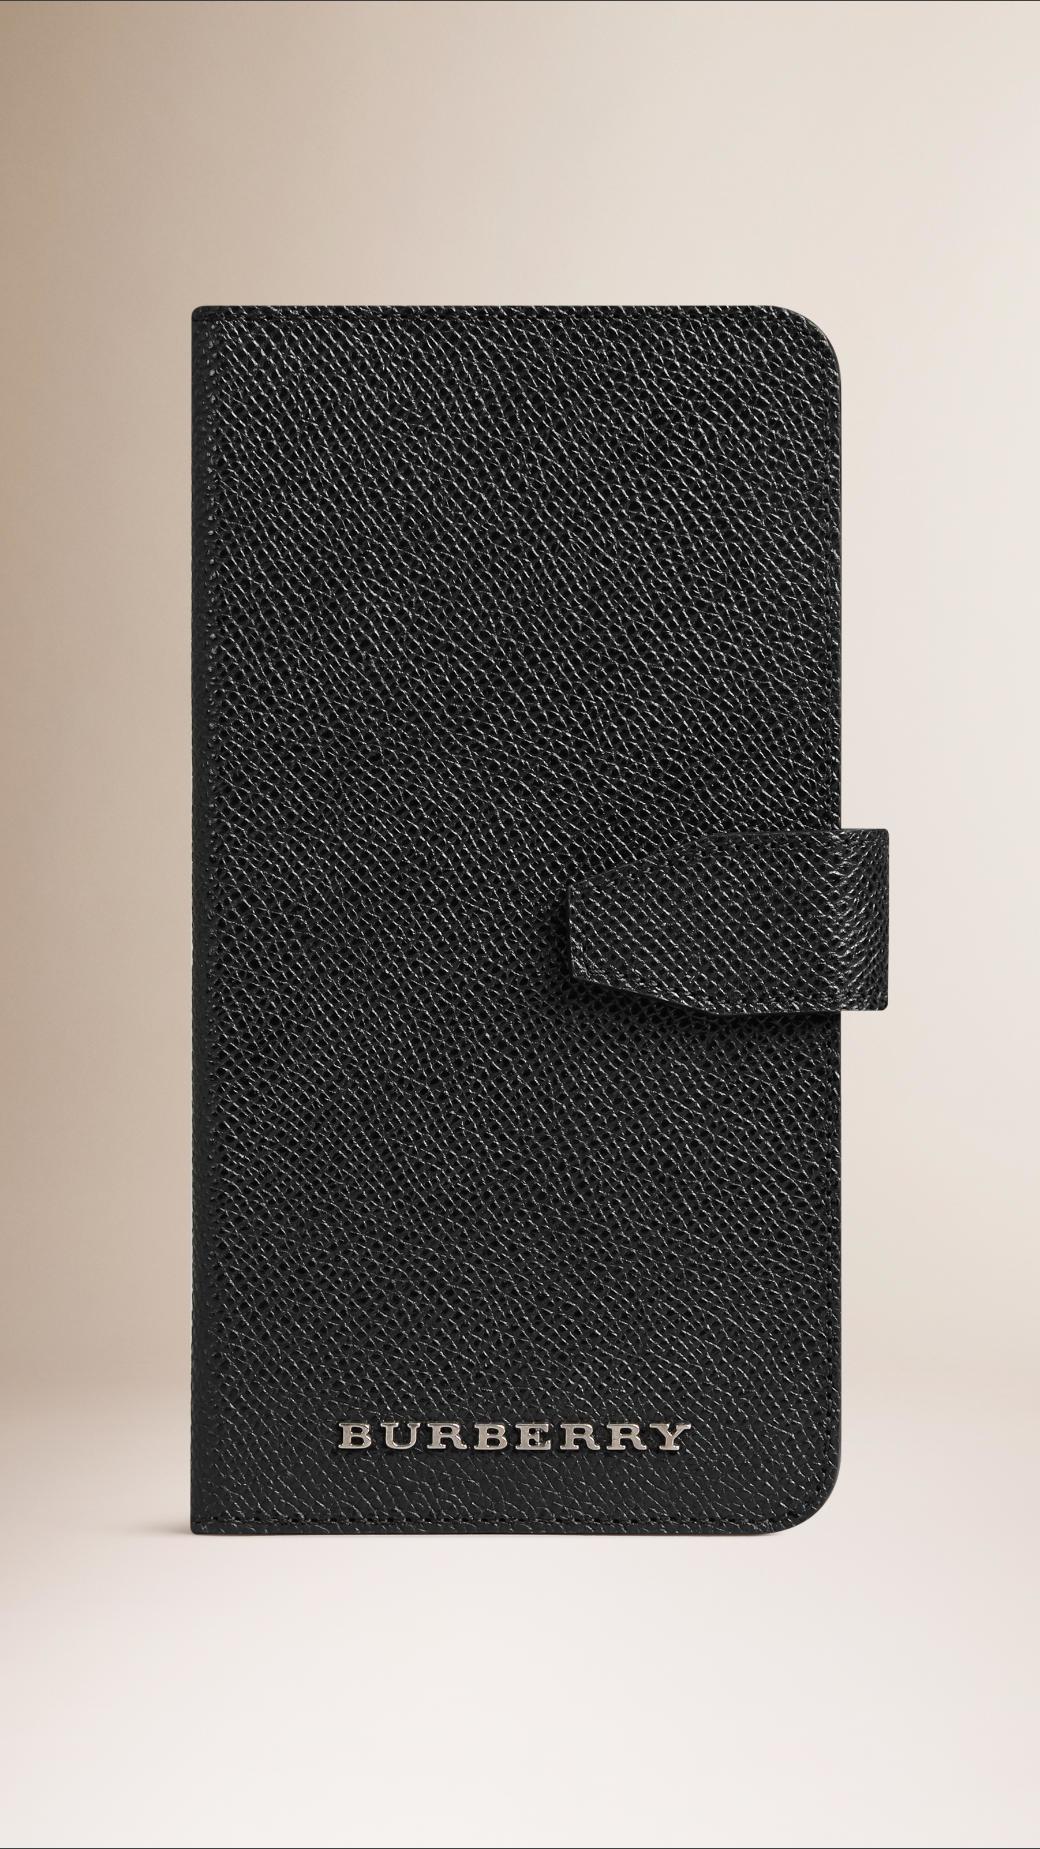 Burberry Iphone 6 Flip Case